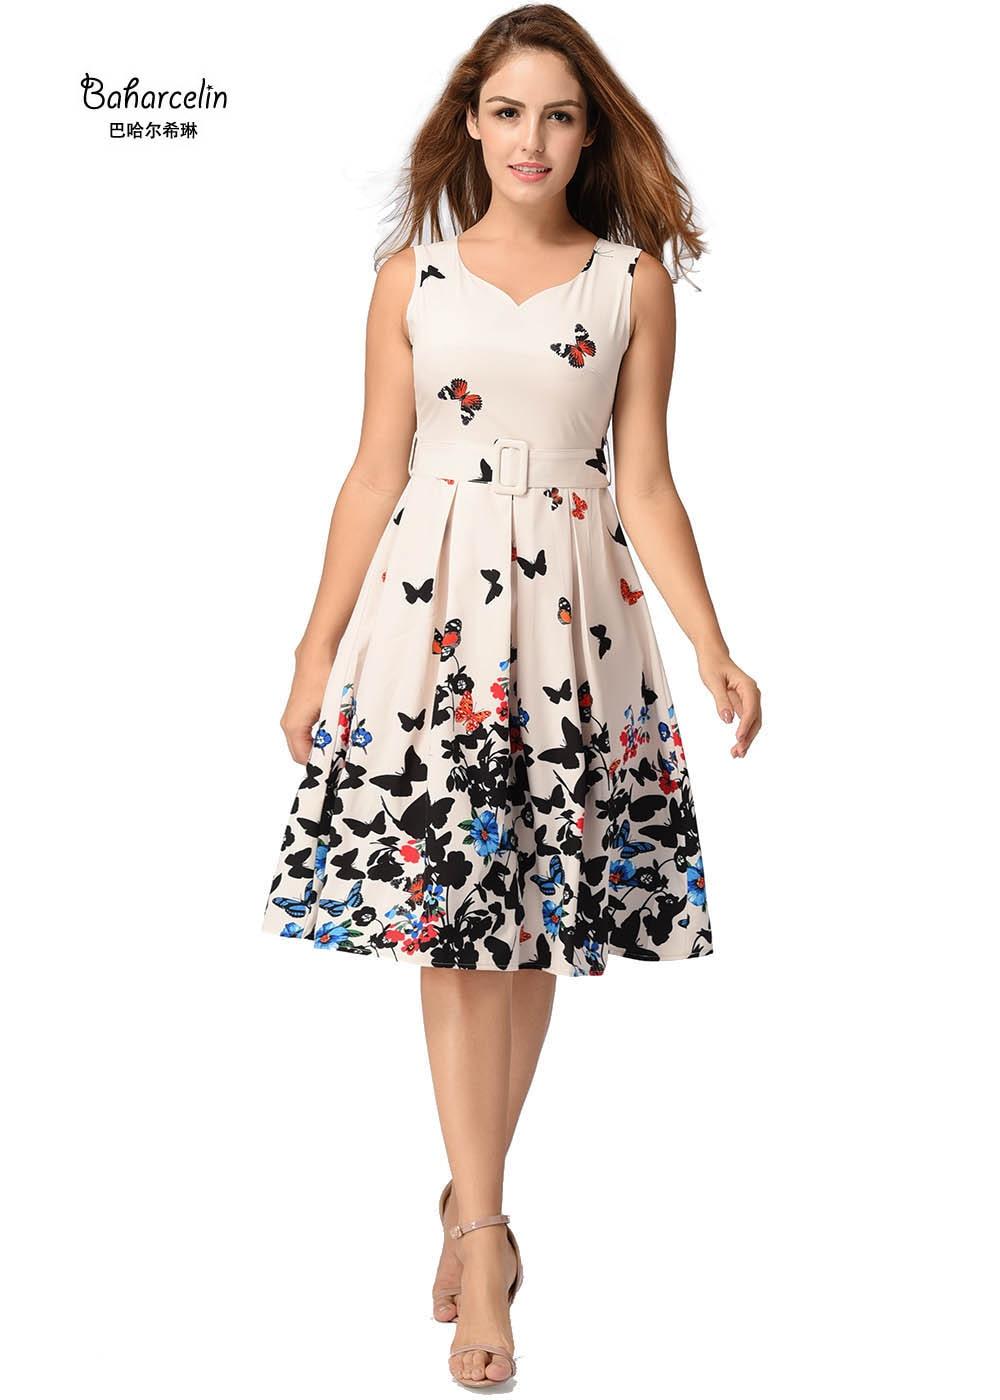 Baharcelin Vestidos 2017 New Summer Dress Sleeveless